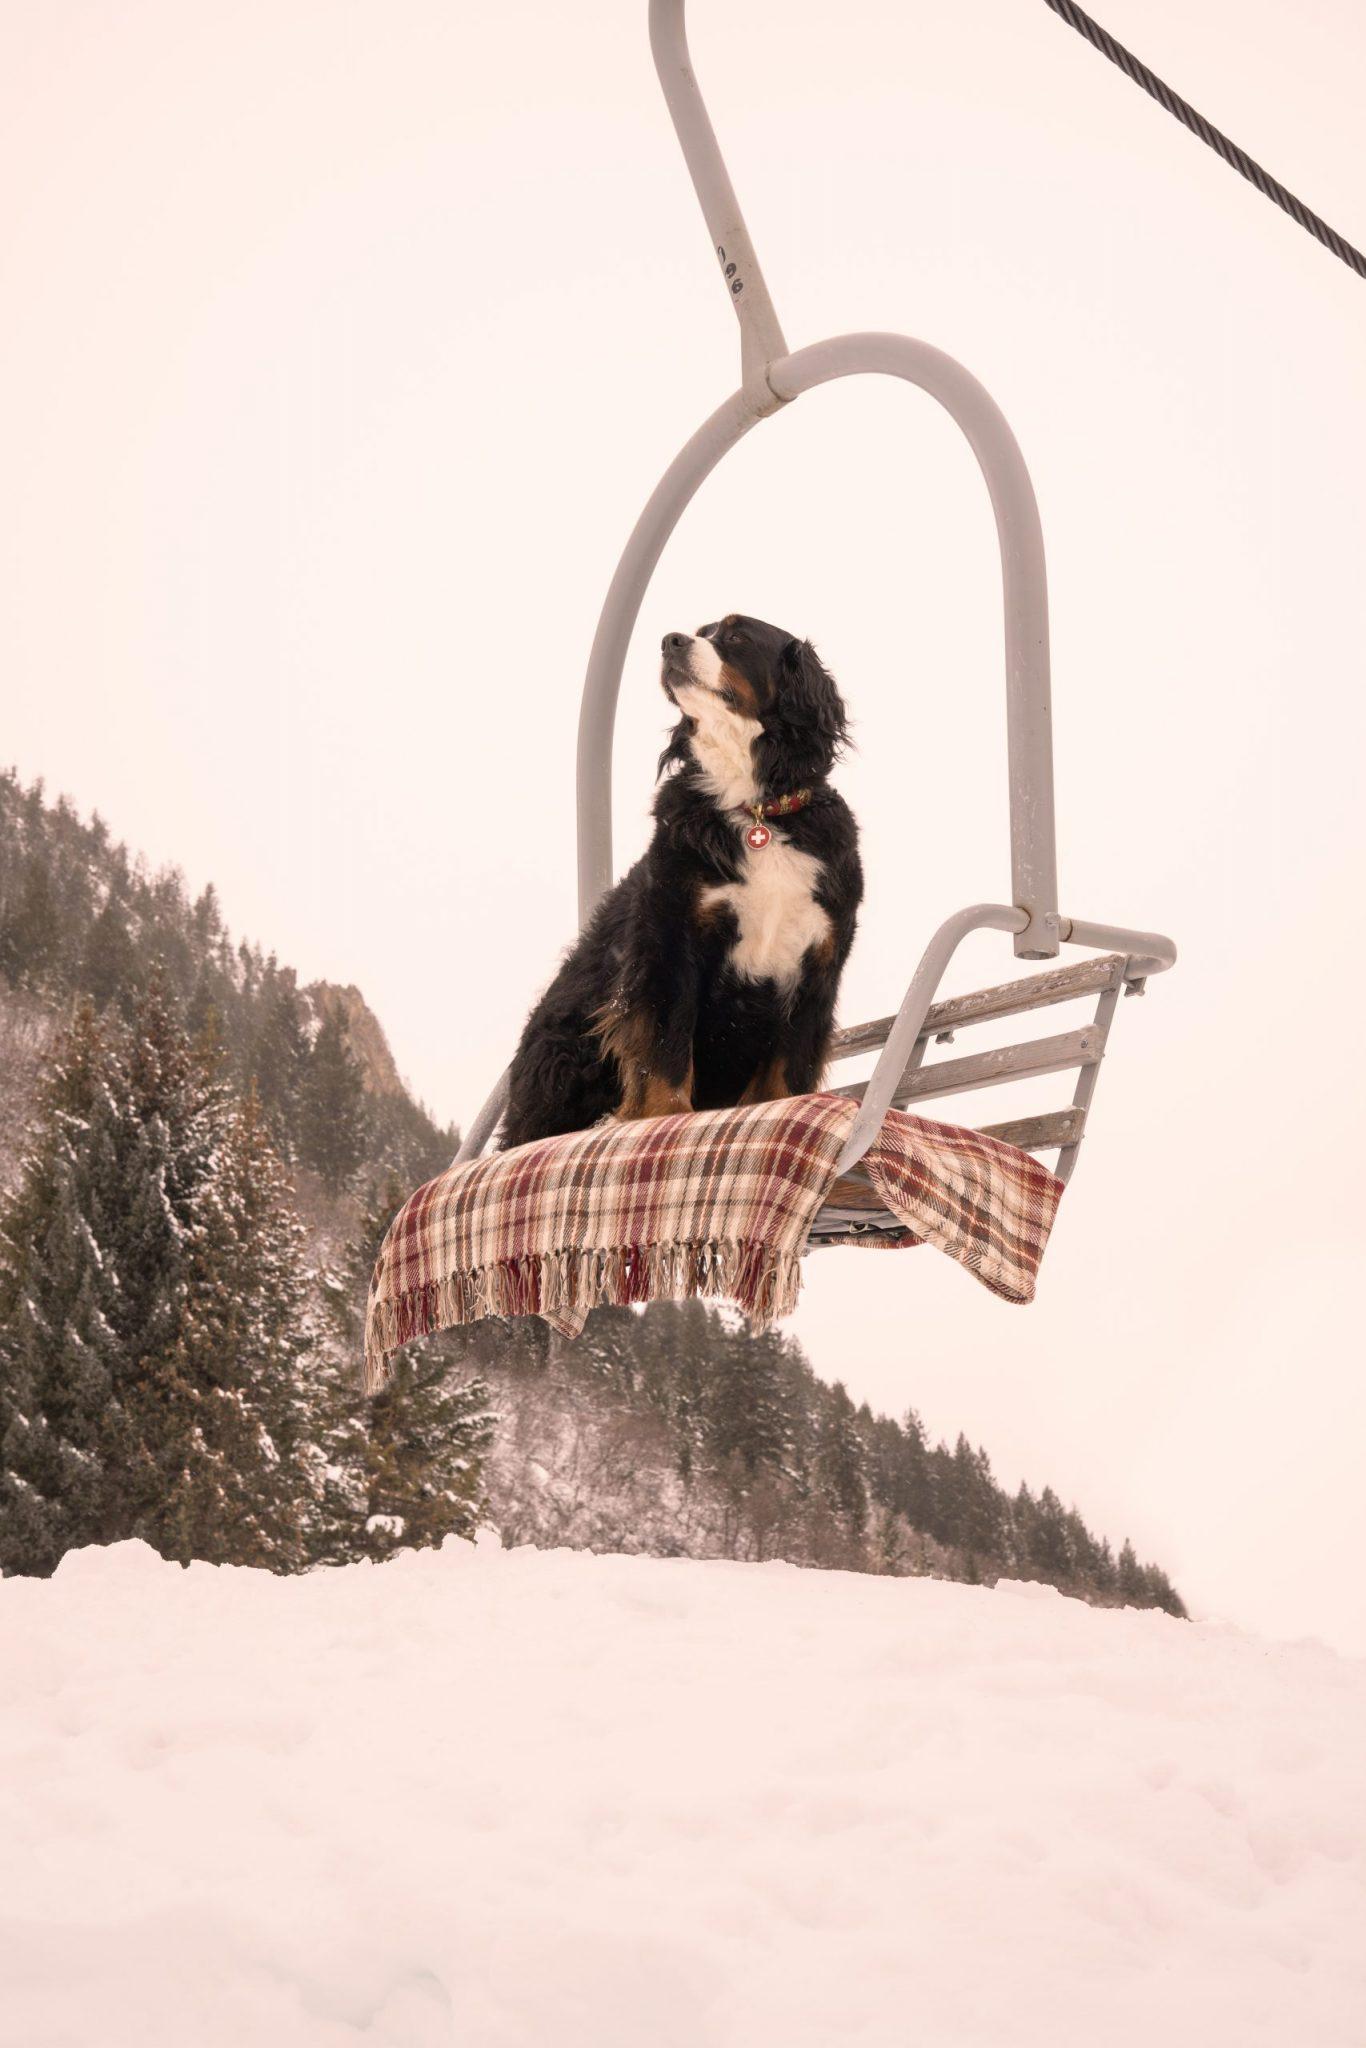 Gray Malin Aspen The Little Nell Photography Art Cherry Creek Magazine